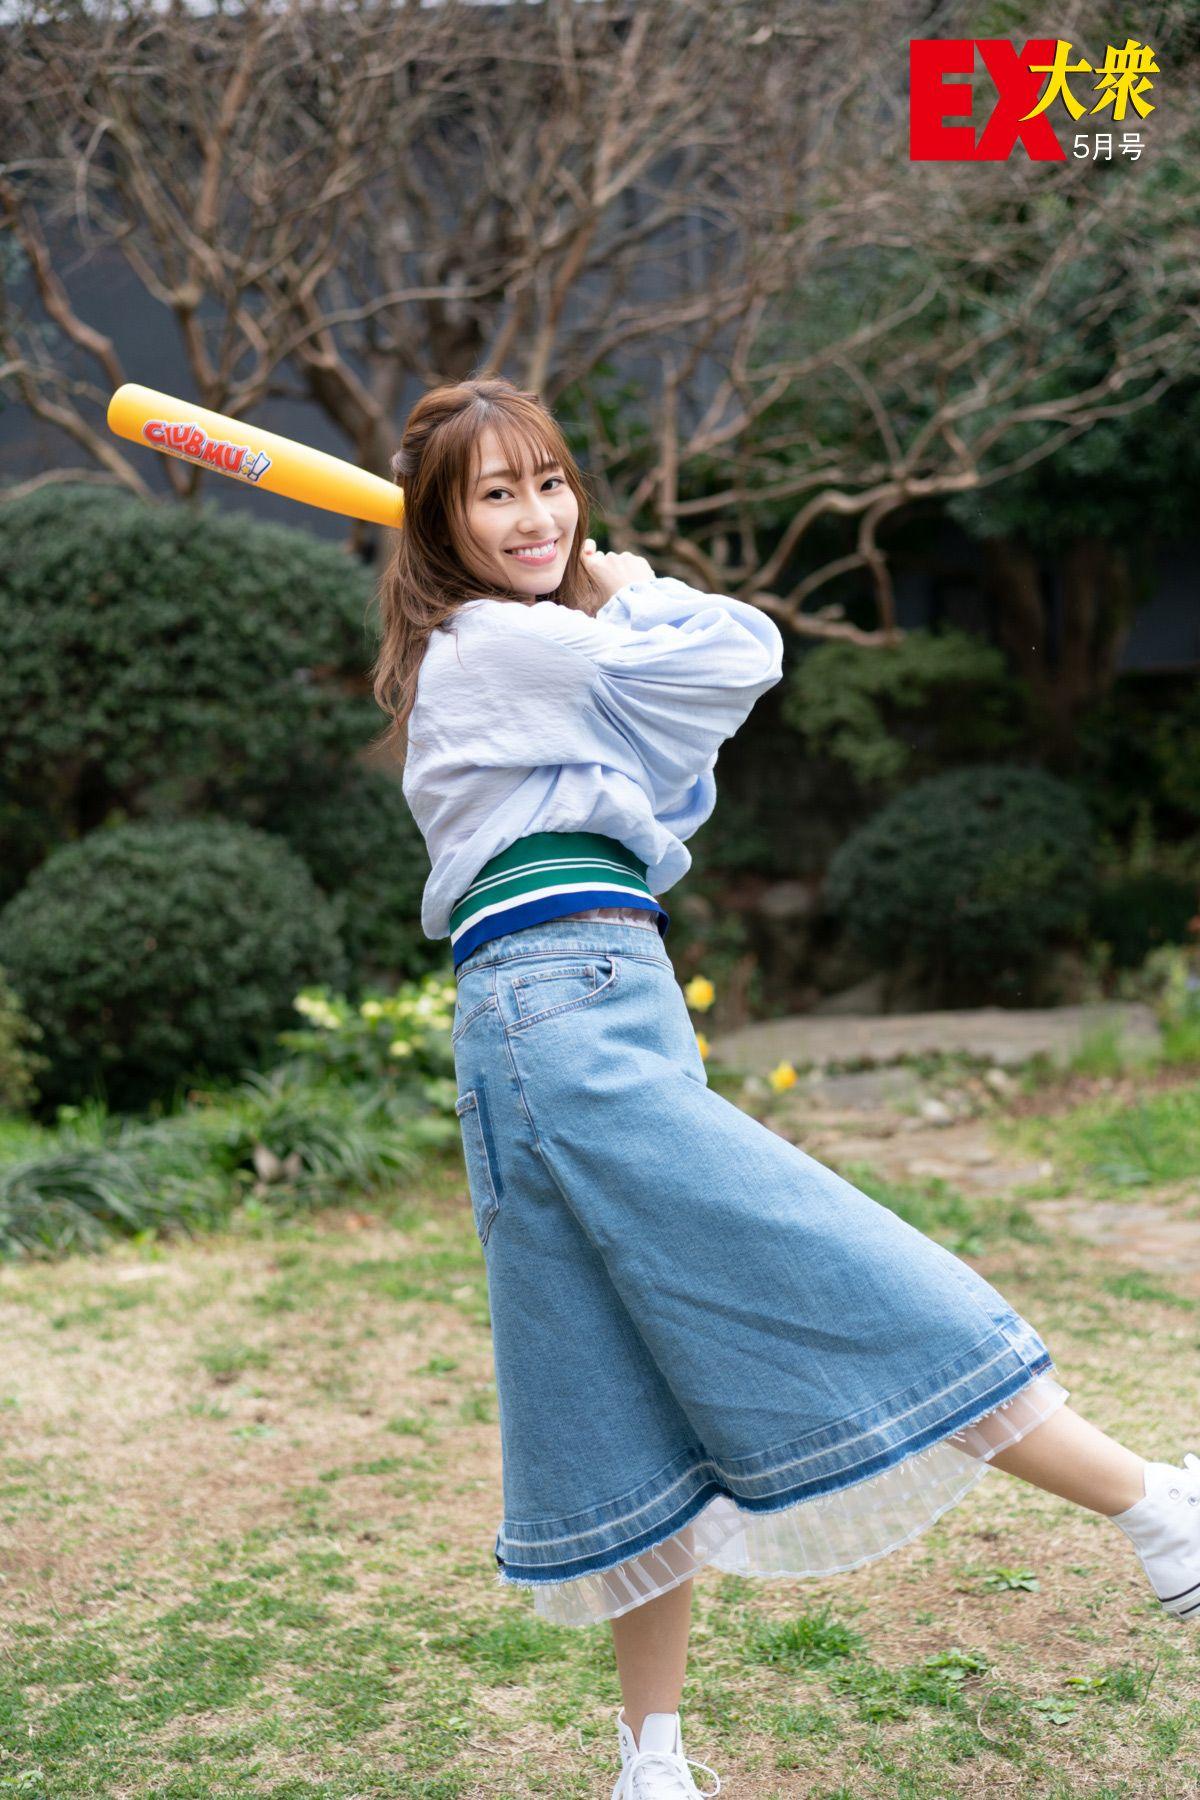 【EX大衆5月号 未掲載カット】乃木坂46桜井玲香のバッティングフォーム